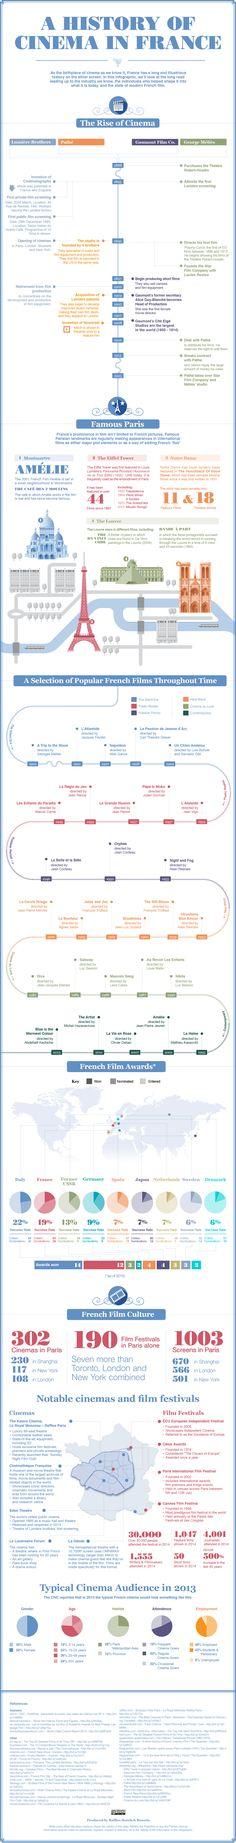 history of cinema in france